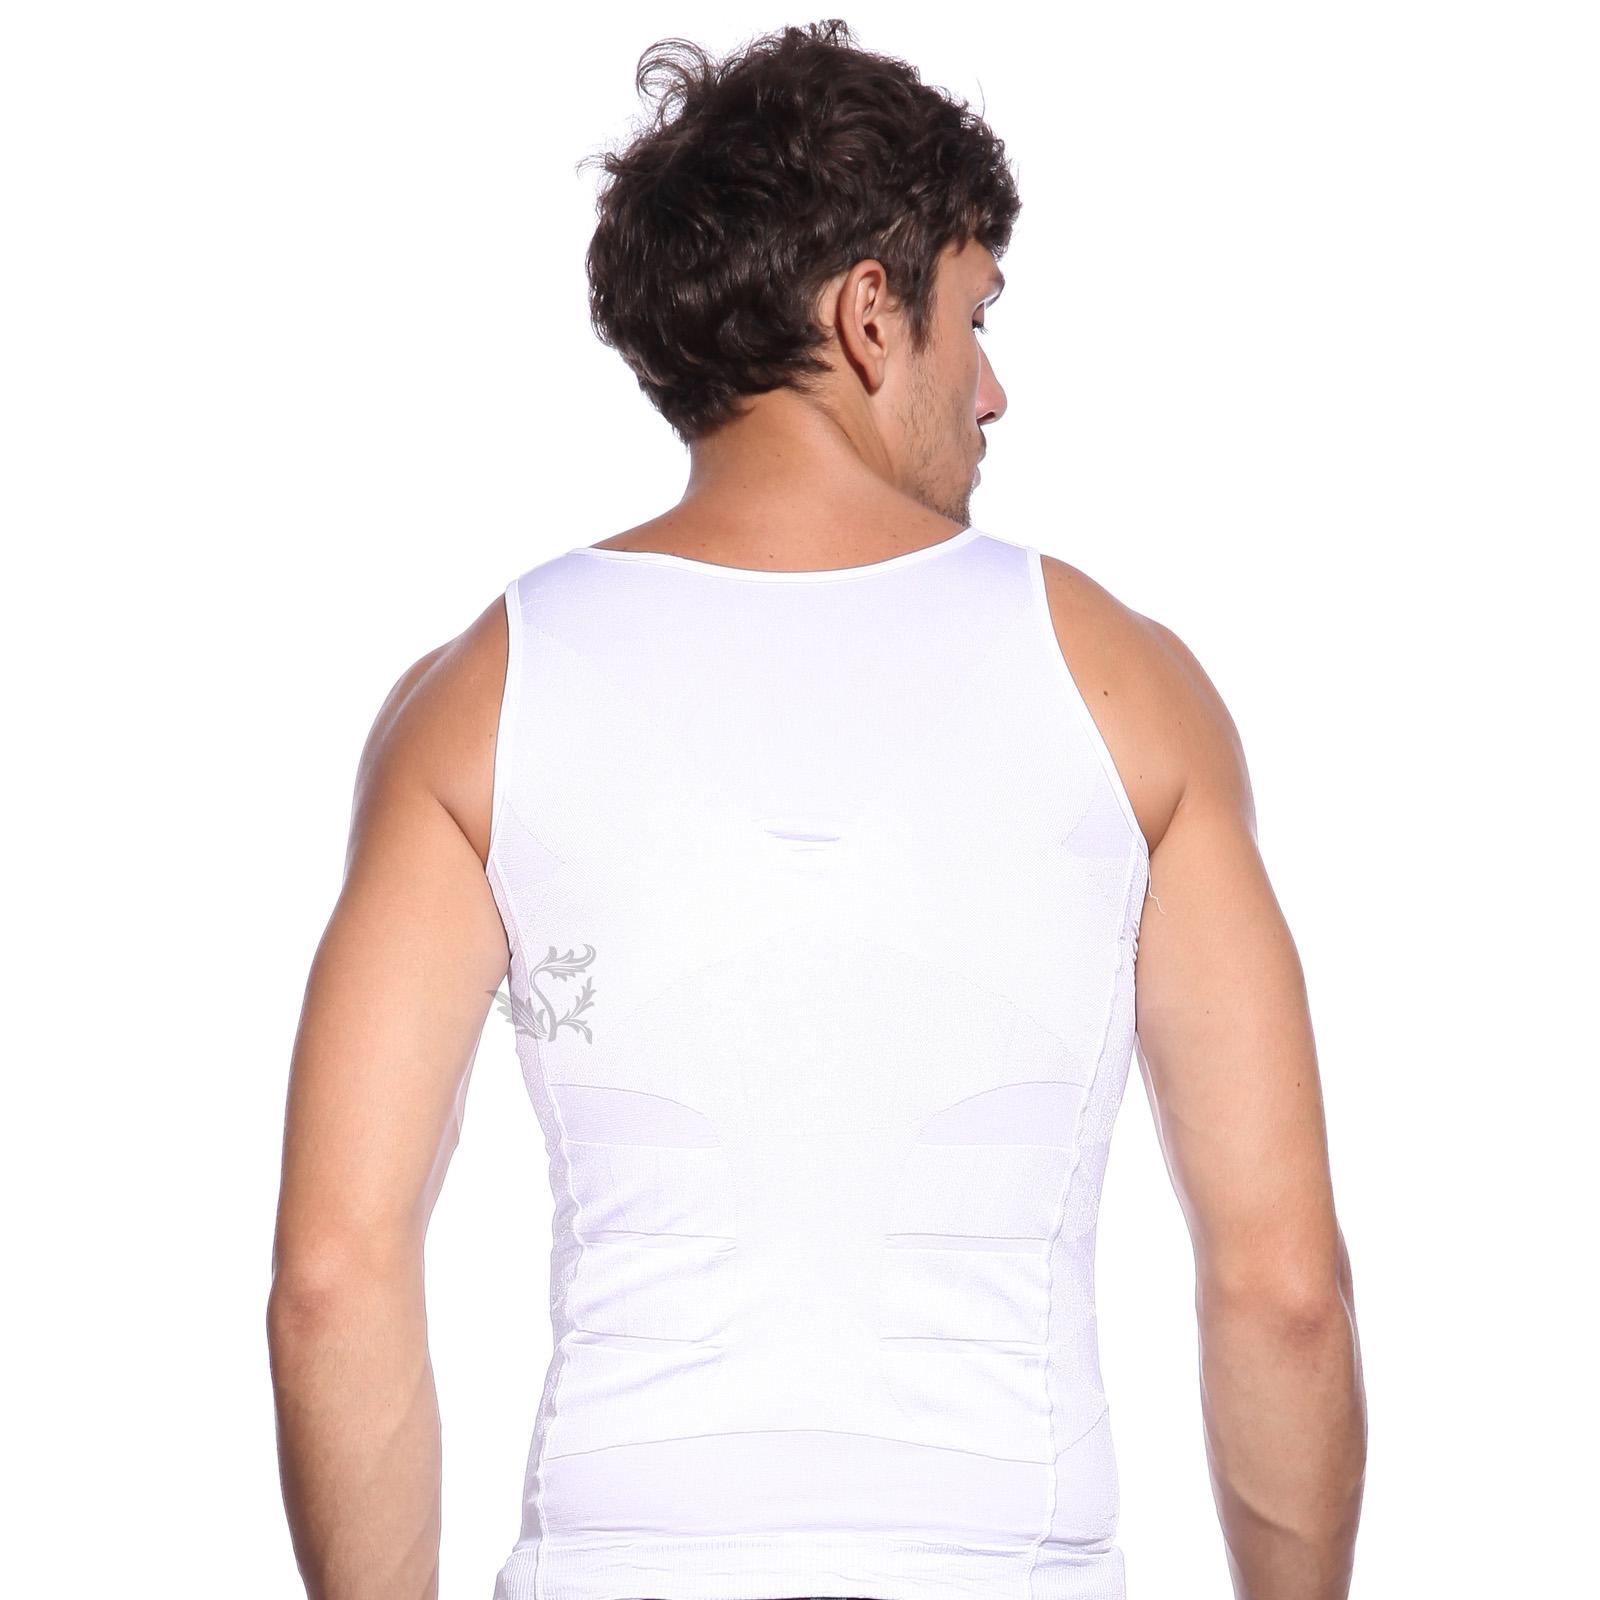 debardeur gaine homme slim ventre plat minceur fitness shaper l xl ebay. Black Bedroom Furniture Sets. Home Design Ideas